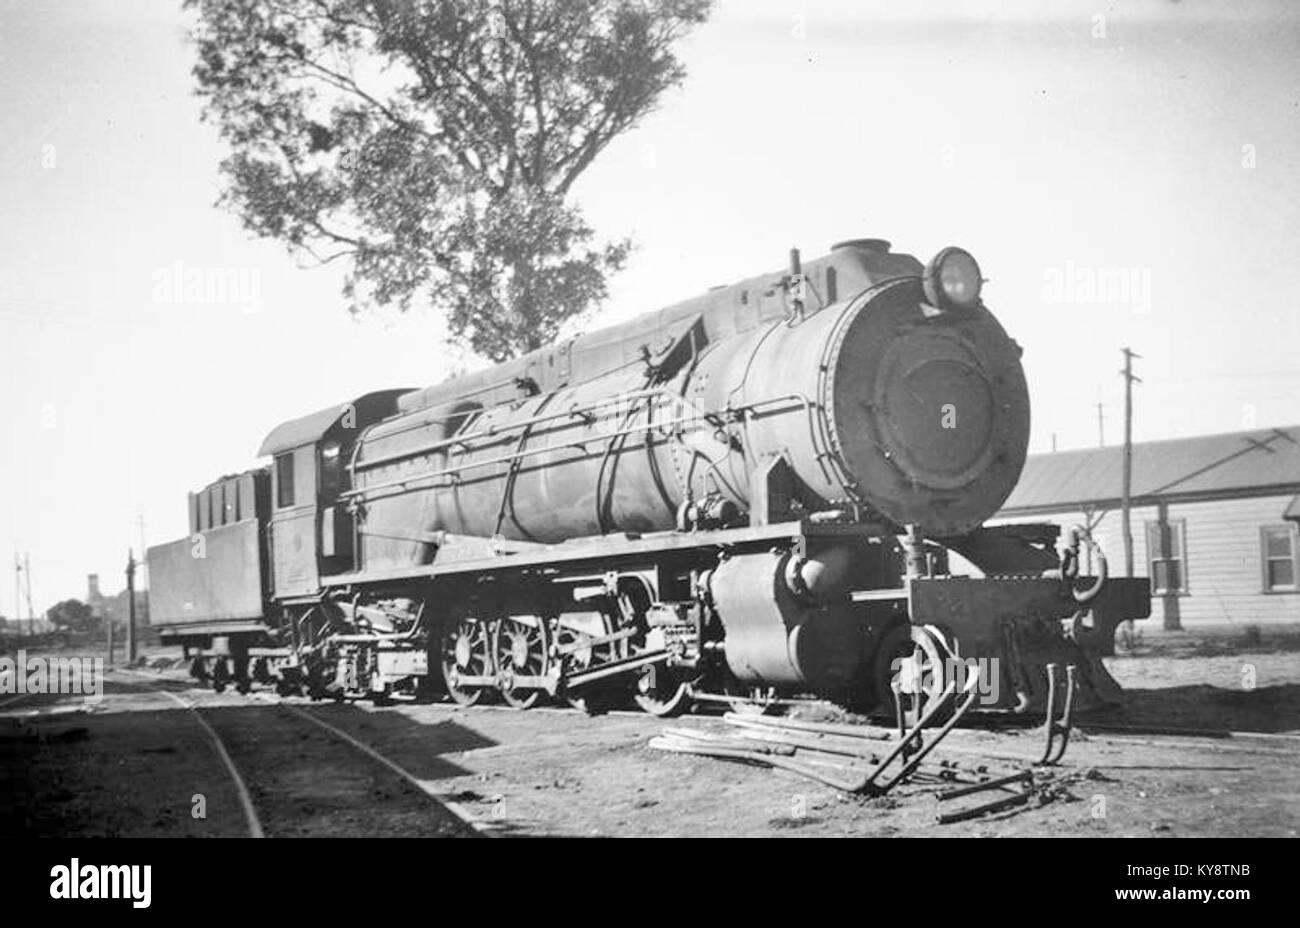 S543, Midland Junction, ca. 1950 - Stock Image